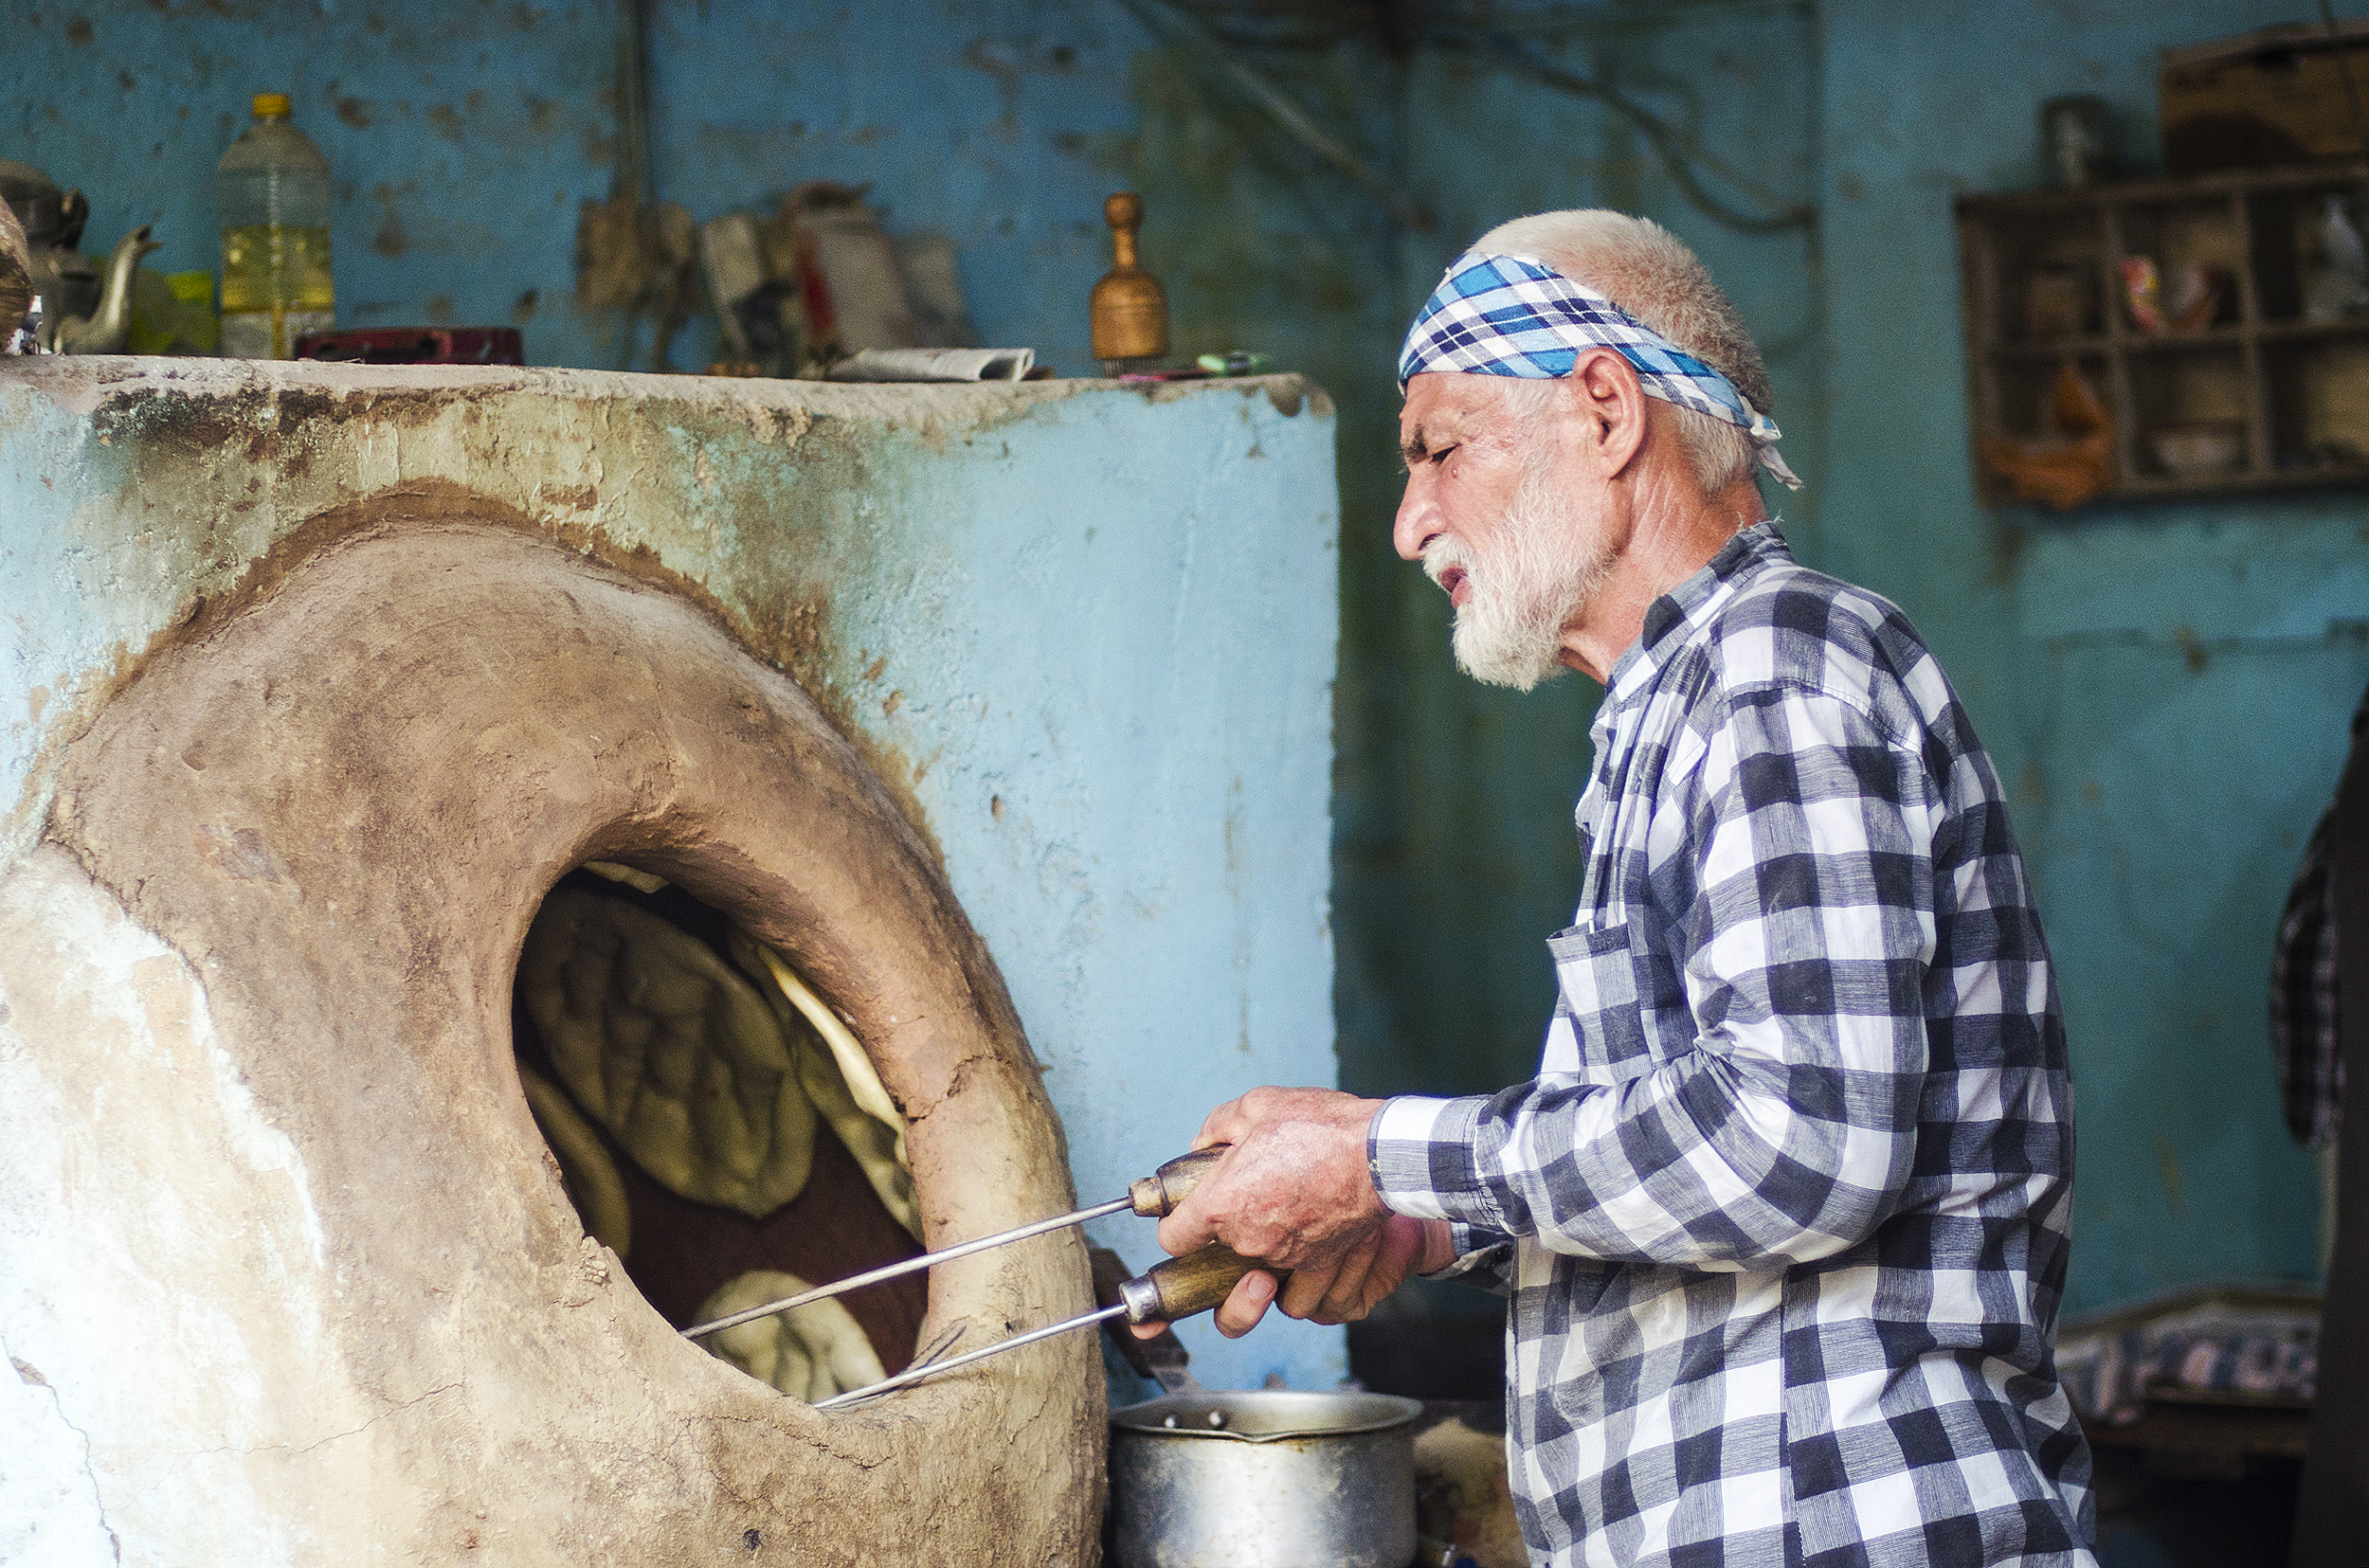 Afghan Bakery in Lajpat Nagar market, Delhi